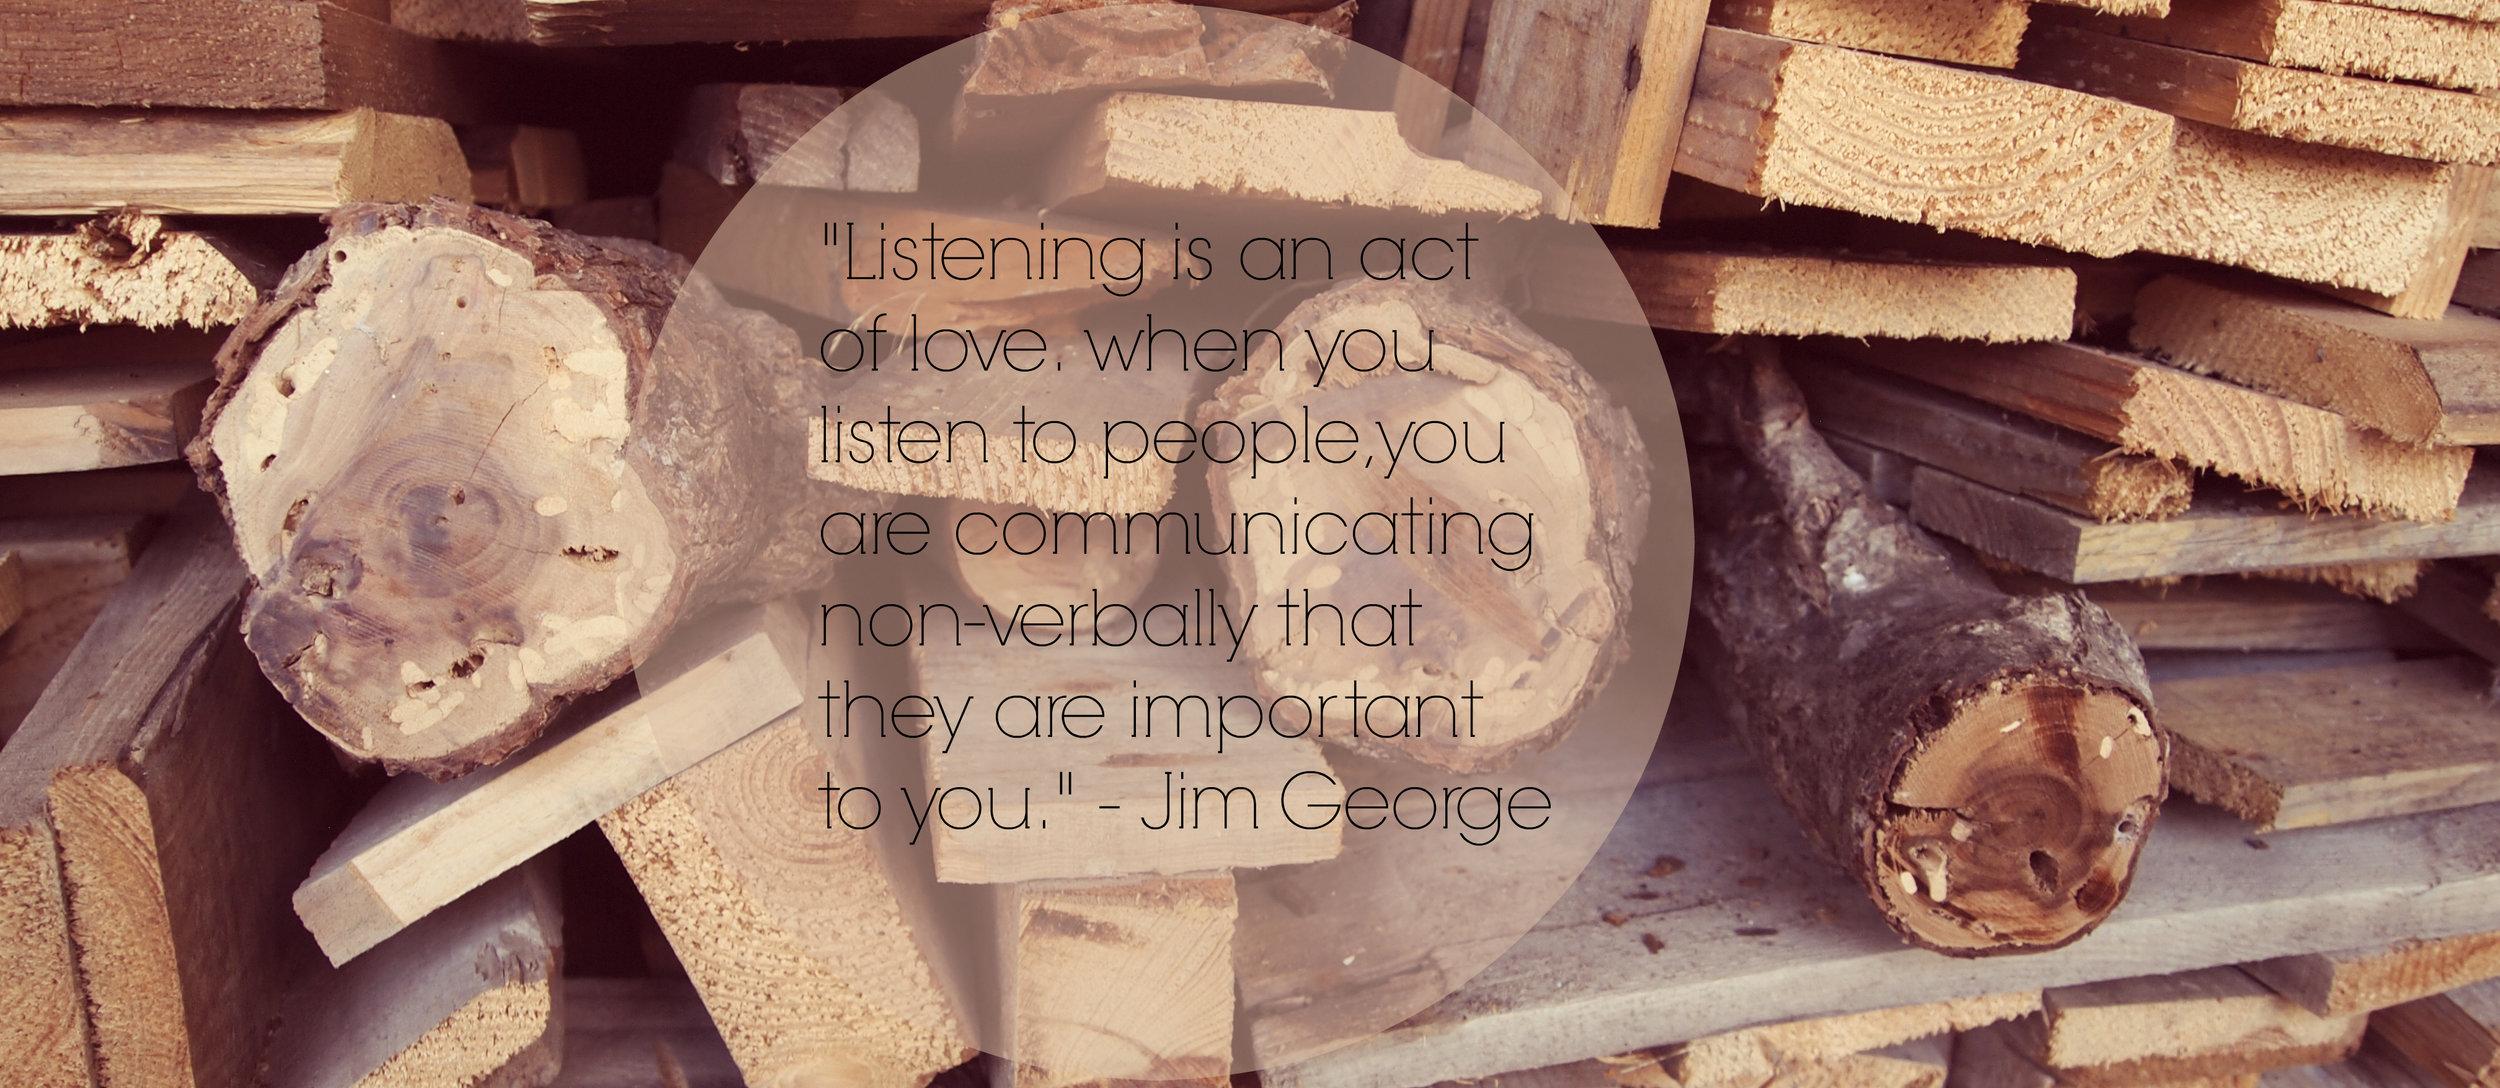 actively listen